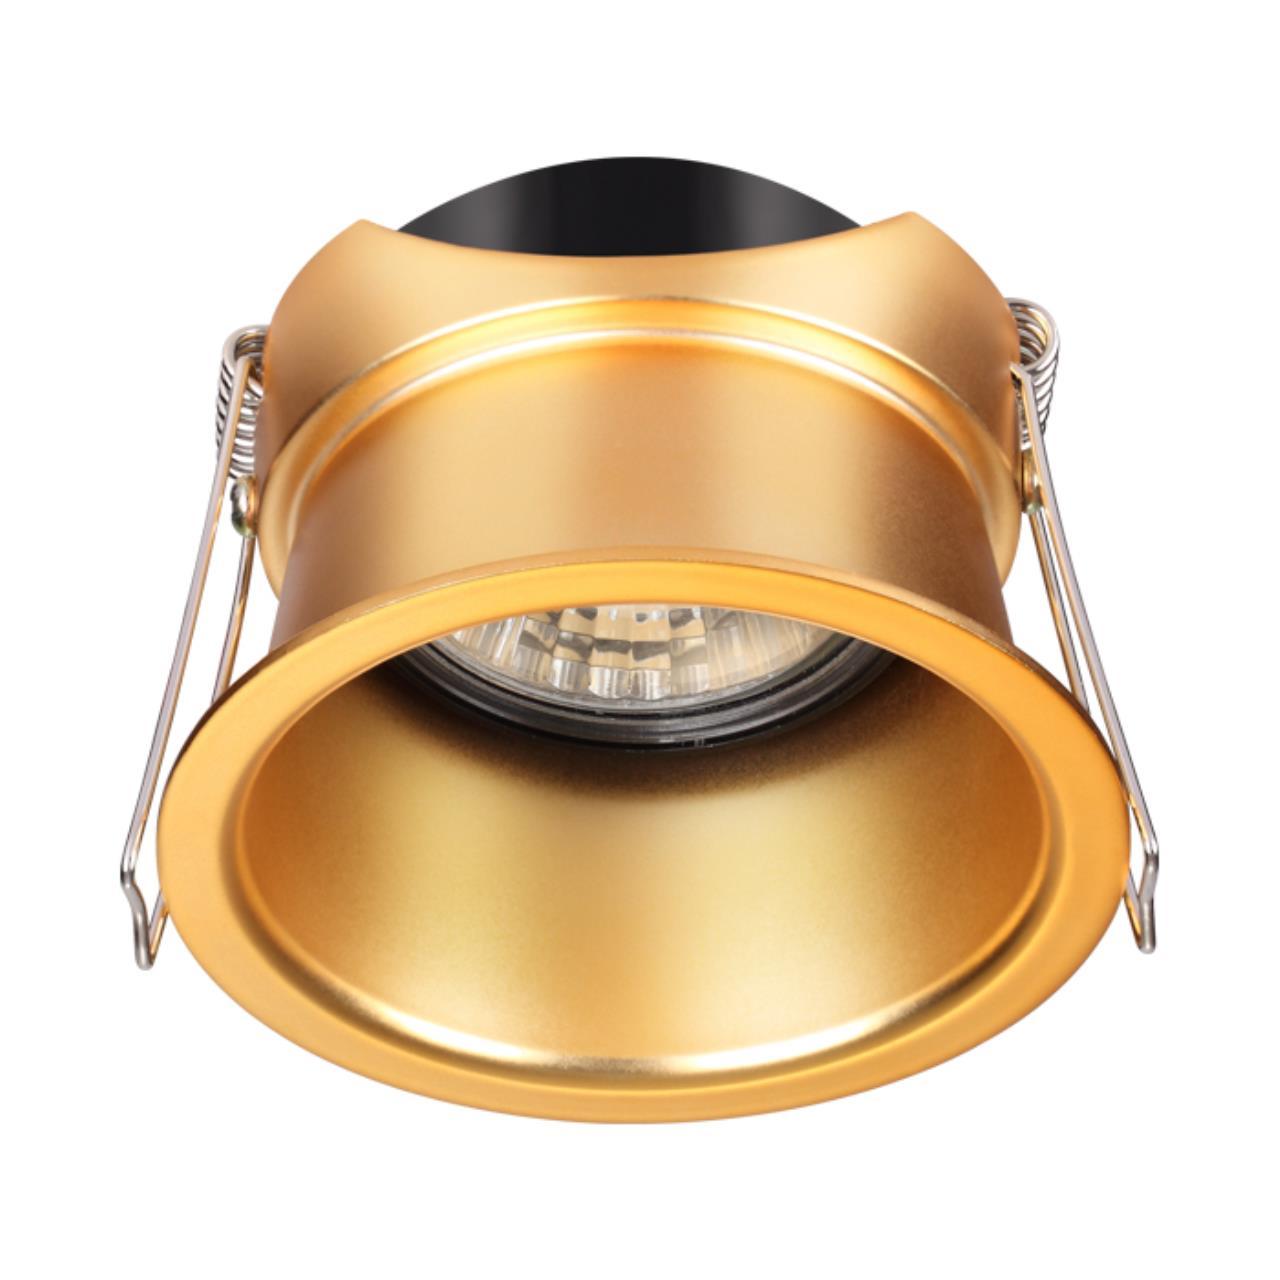 370447 SPOT NT19 130 золото Встраиваемый светильник IP20 GU10 50W 220V BUTT